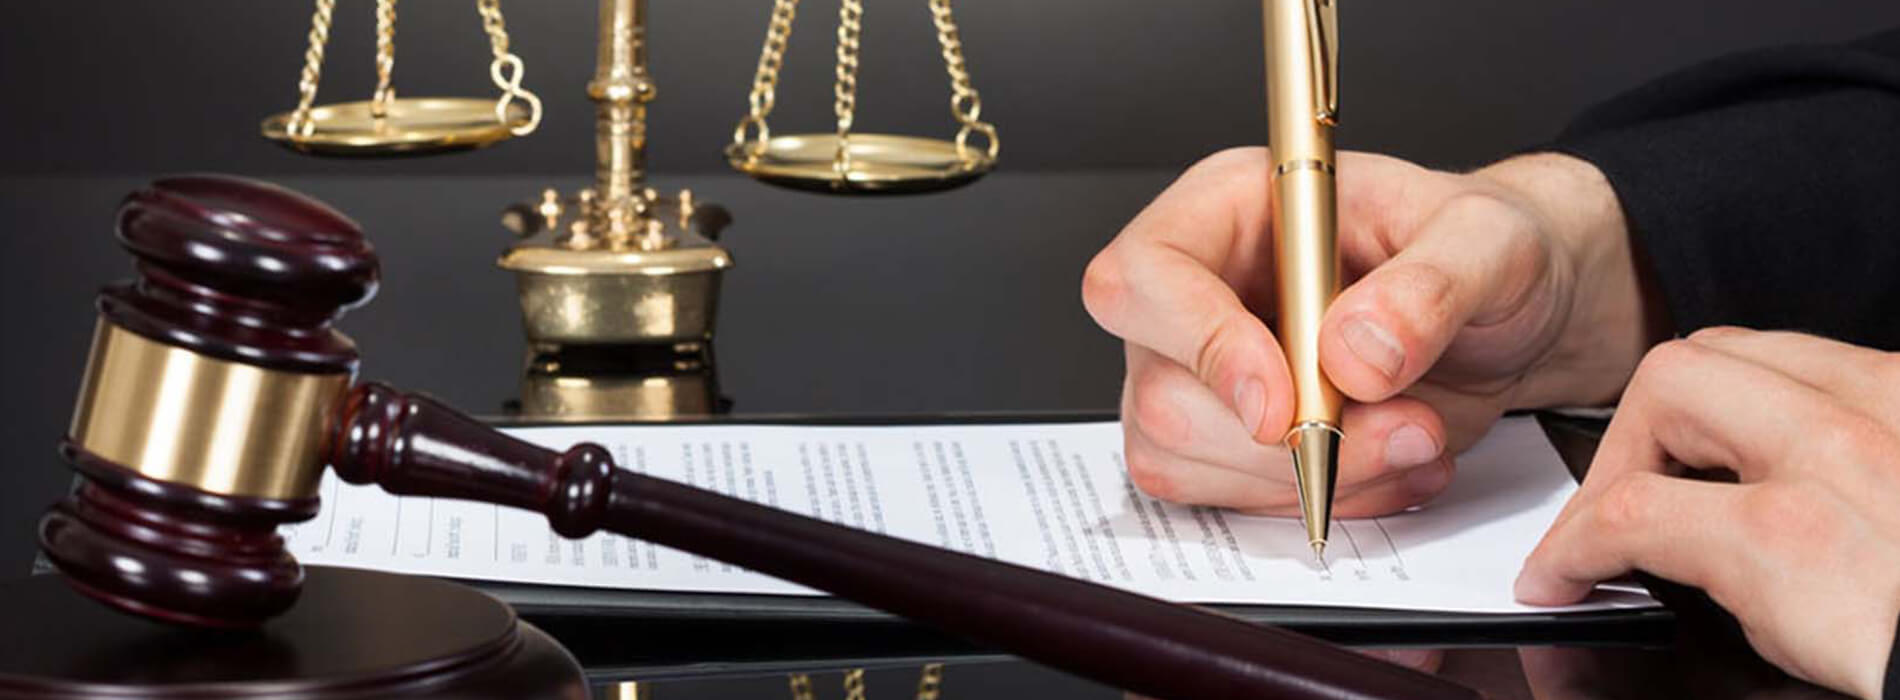 Incredible Legal/Non-Legal Interpreting Services